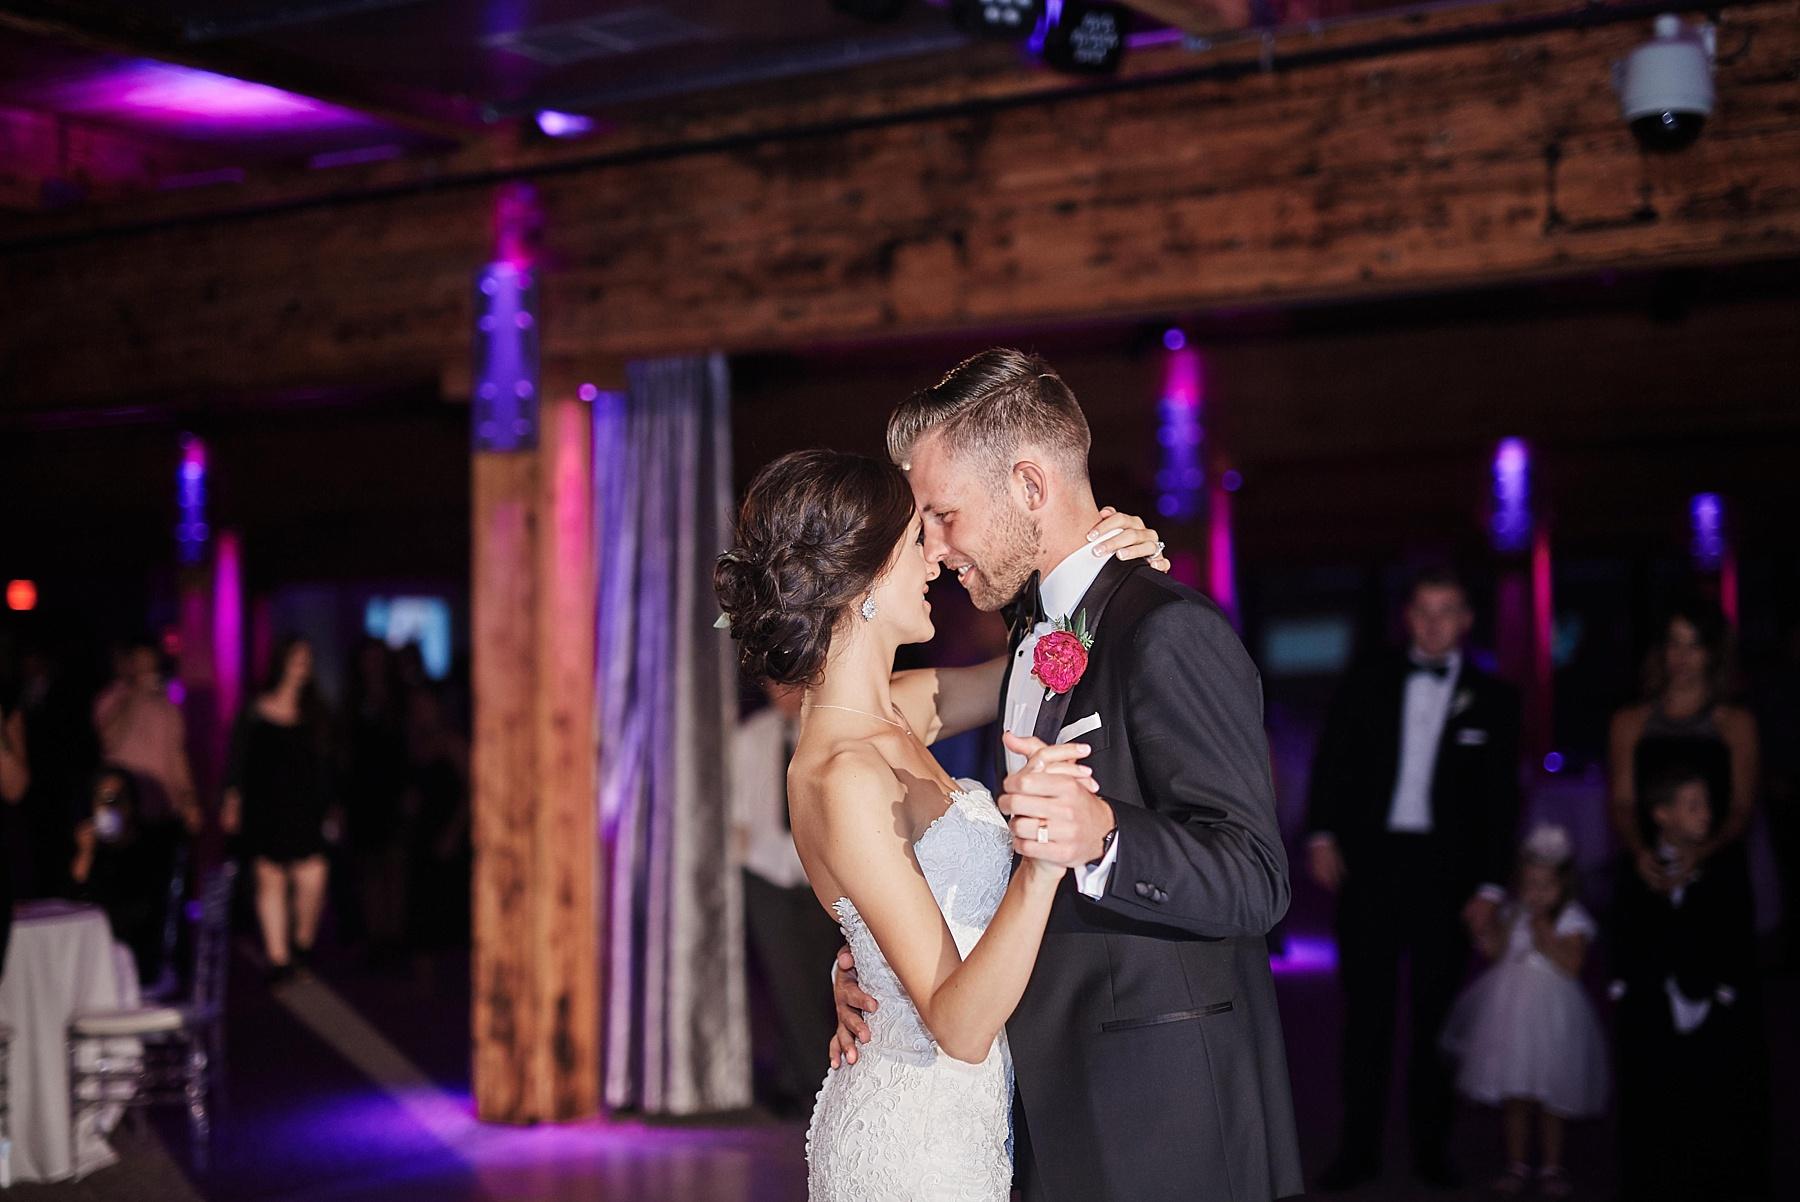 ABULAE-Wedding-Saint-paul-MN-Josh-Sofia-Wedding-Mears-Park_0842.jpg